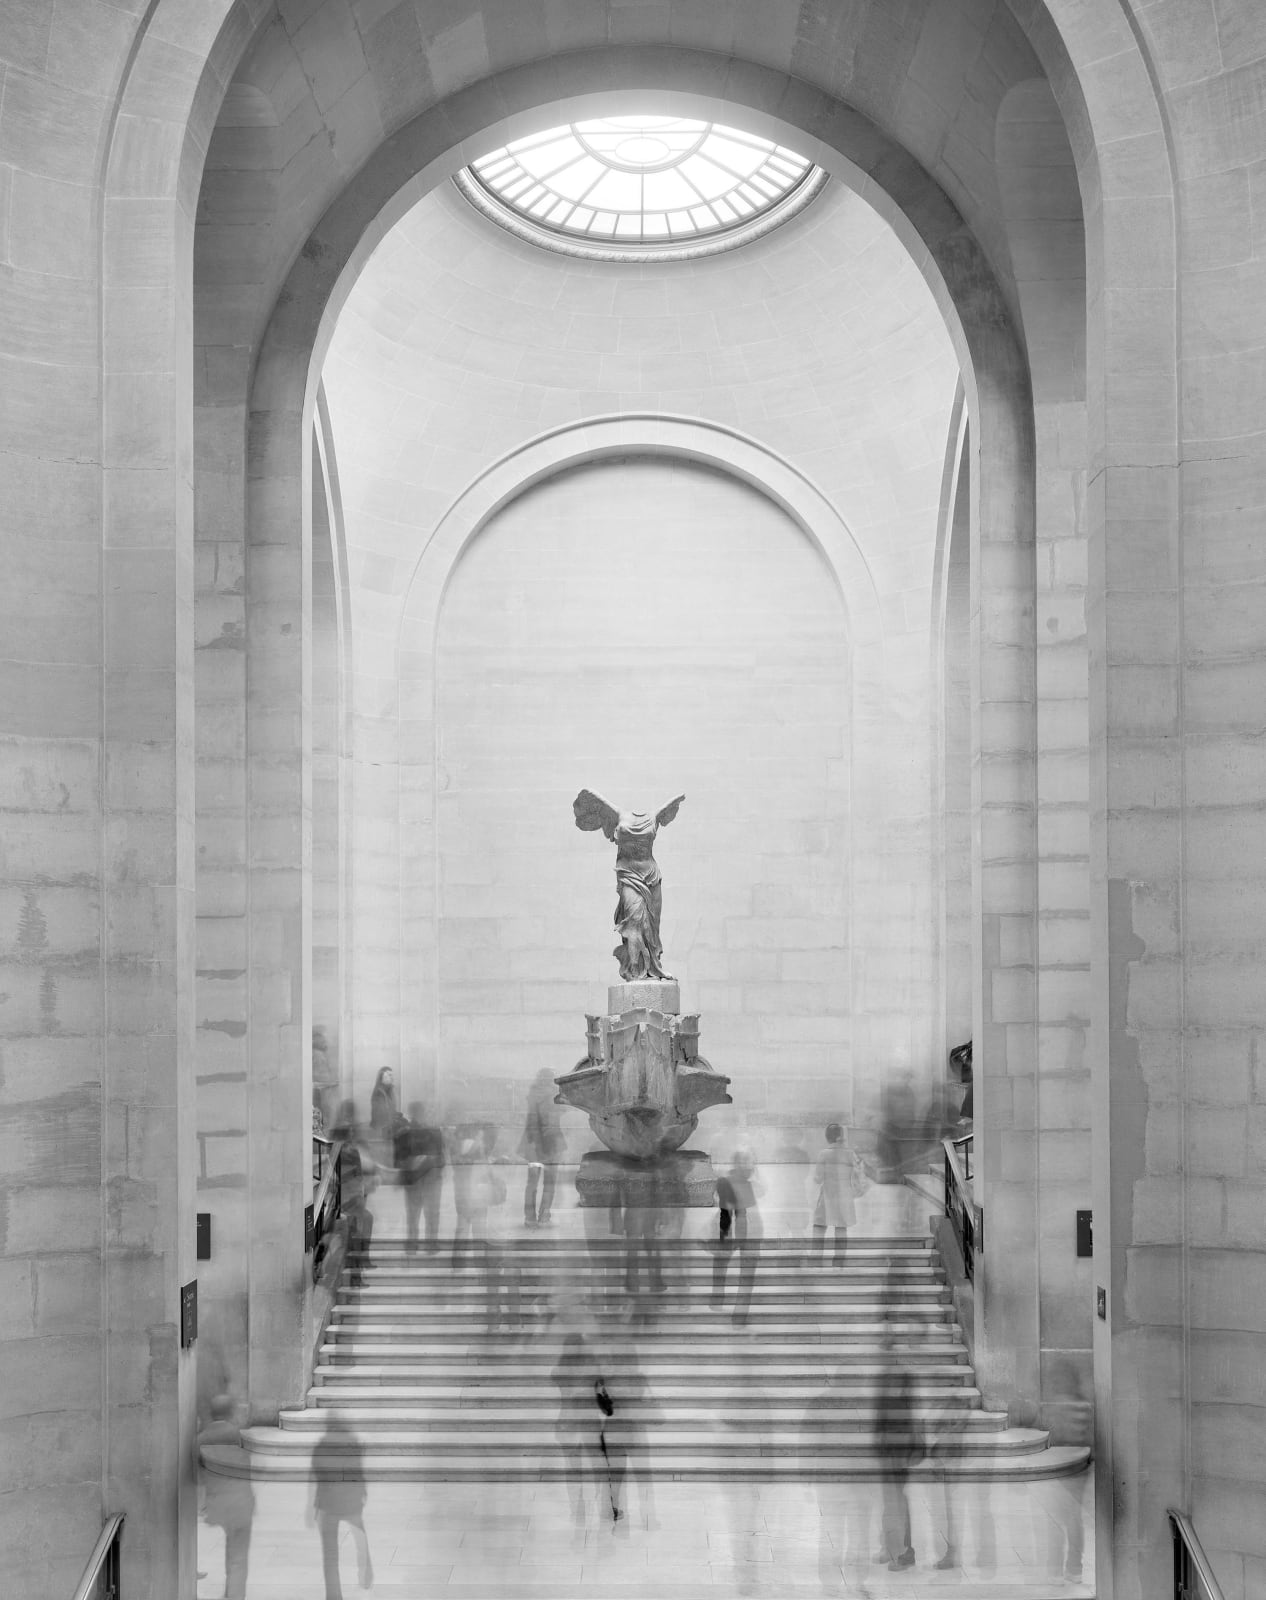 Matthew Pillsbury, Winged Victory, the Louvre, 2008